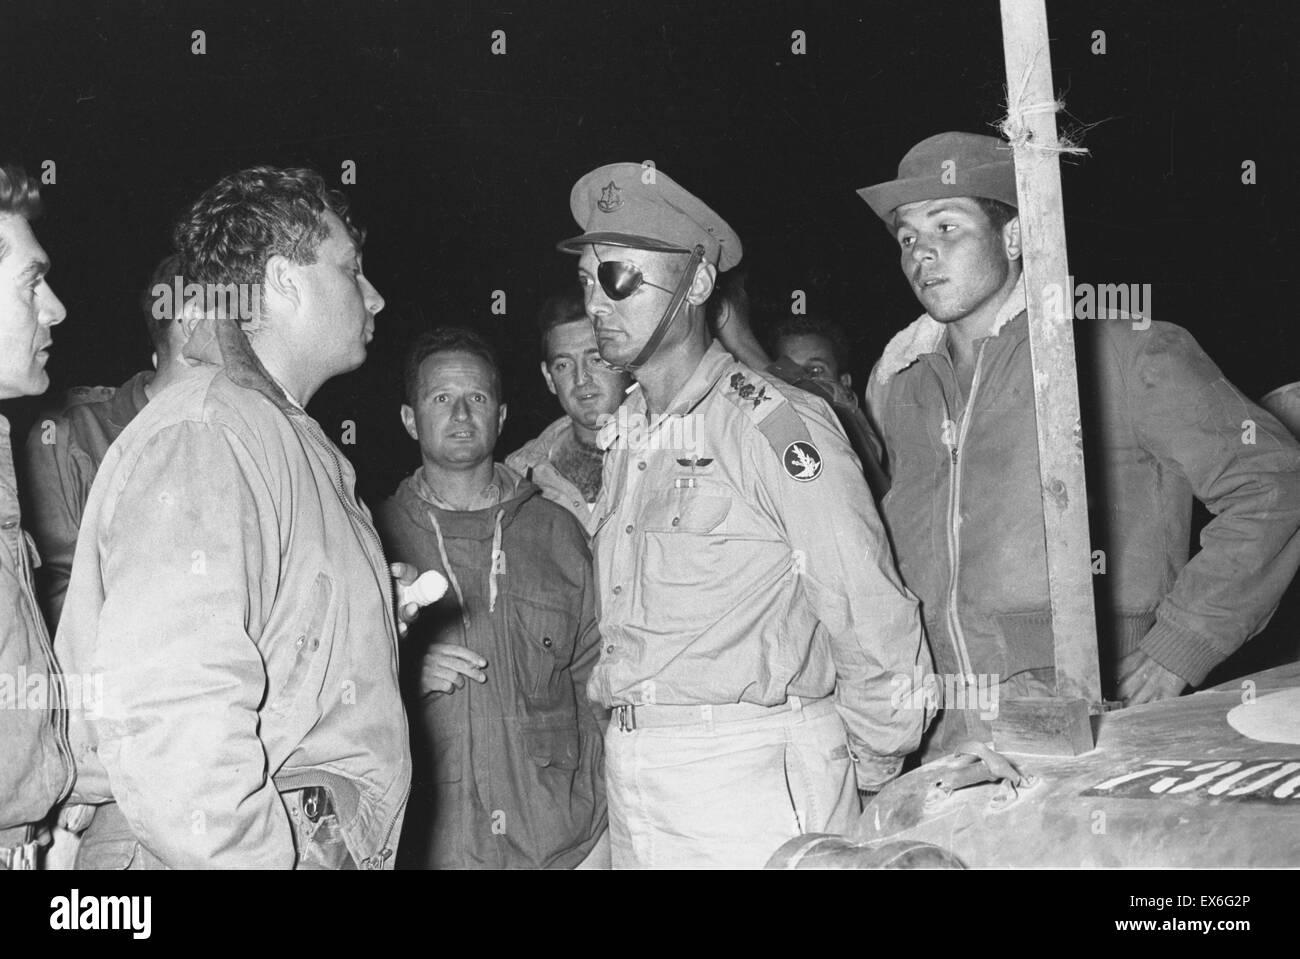 Suez campaign 1956, Colonel David Elazar, Colonel Ariel Sharon, Colonel Uzi Narkis General Moshe Dayan - Stock Image